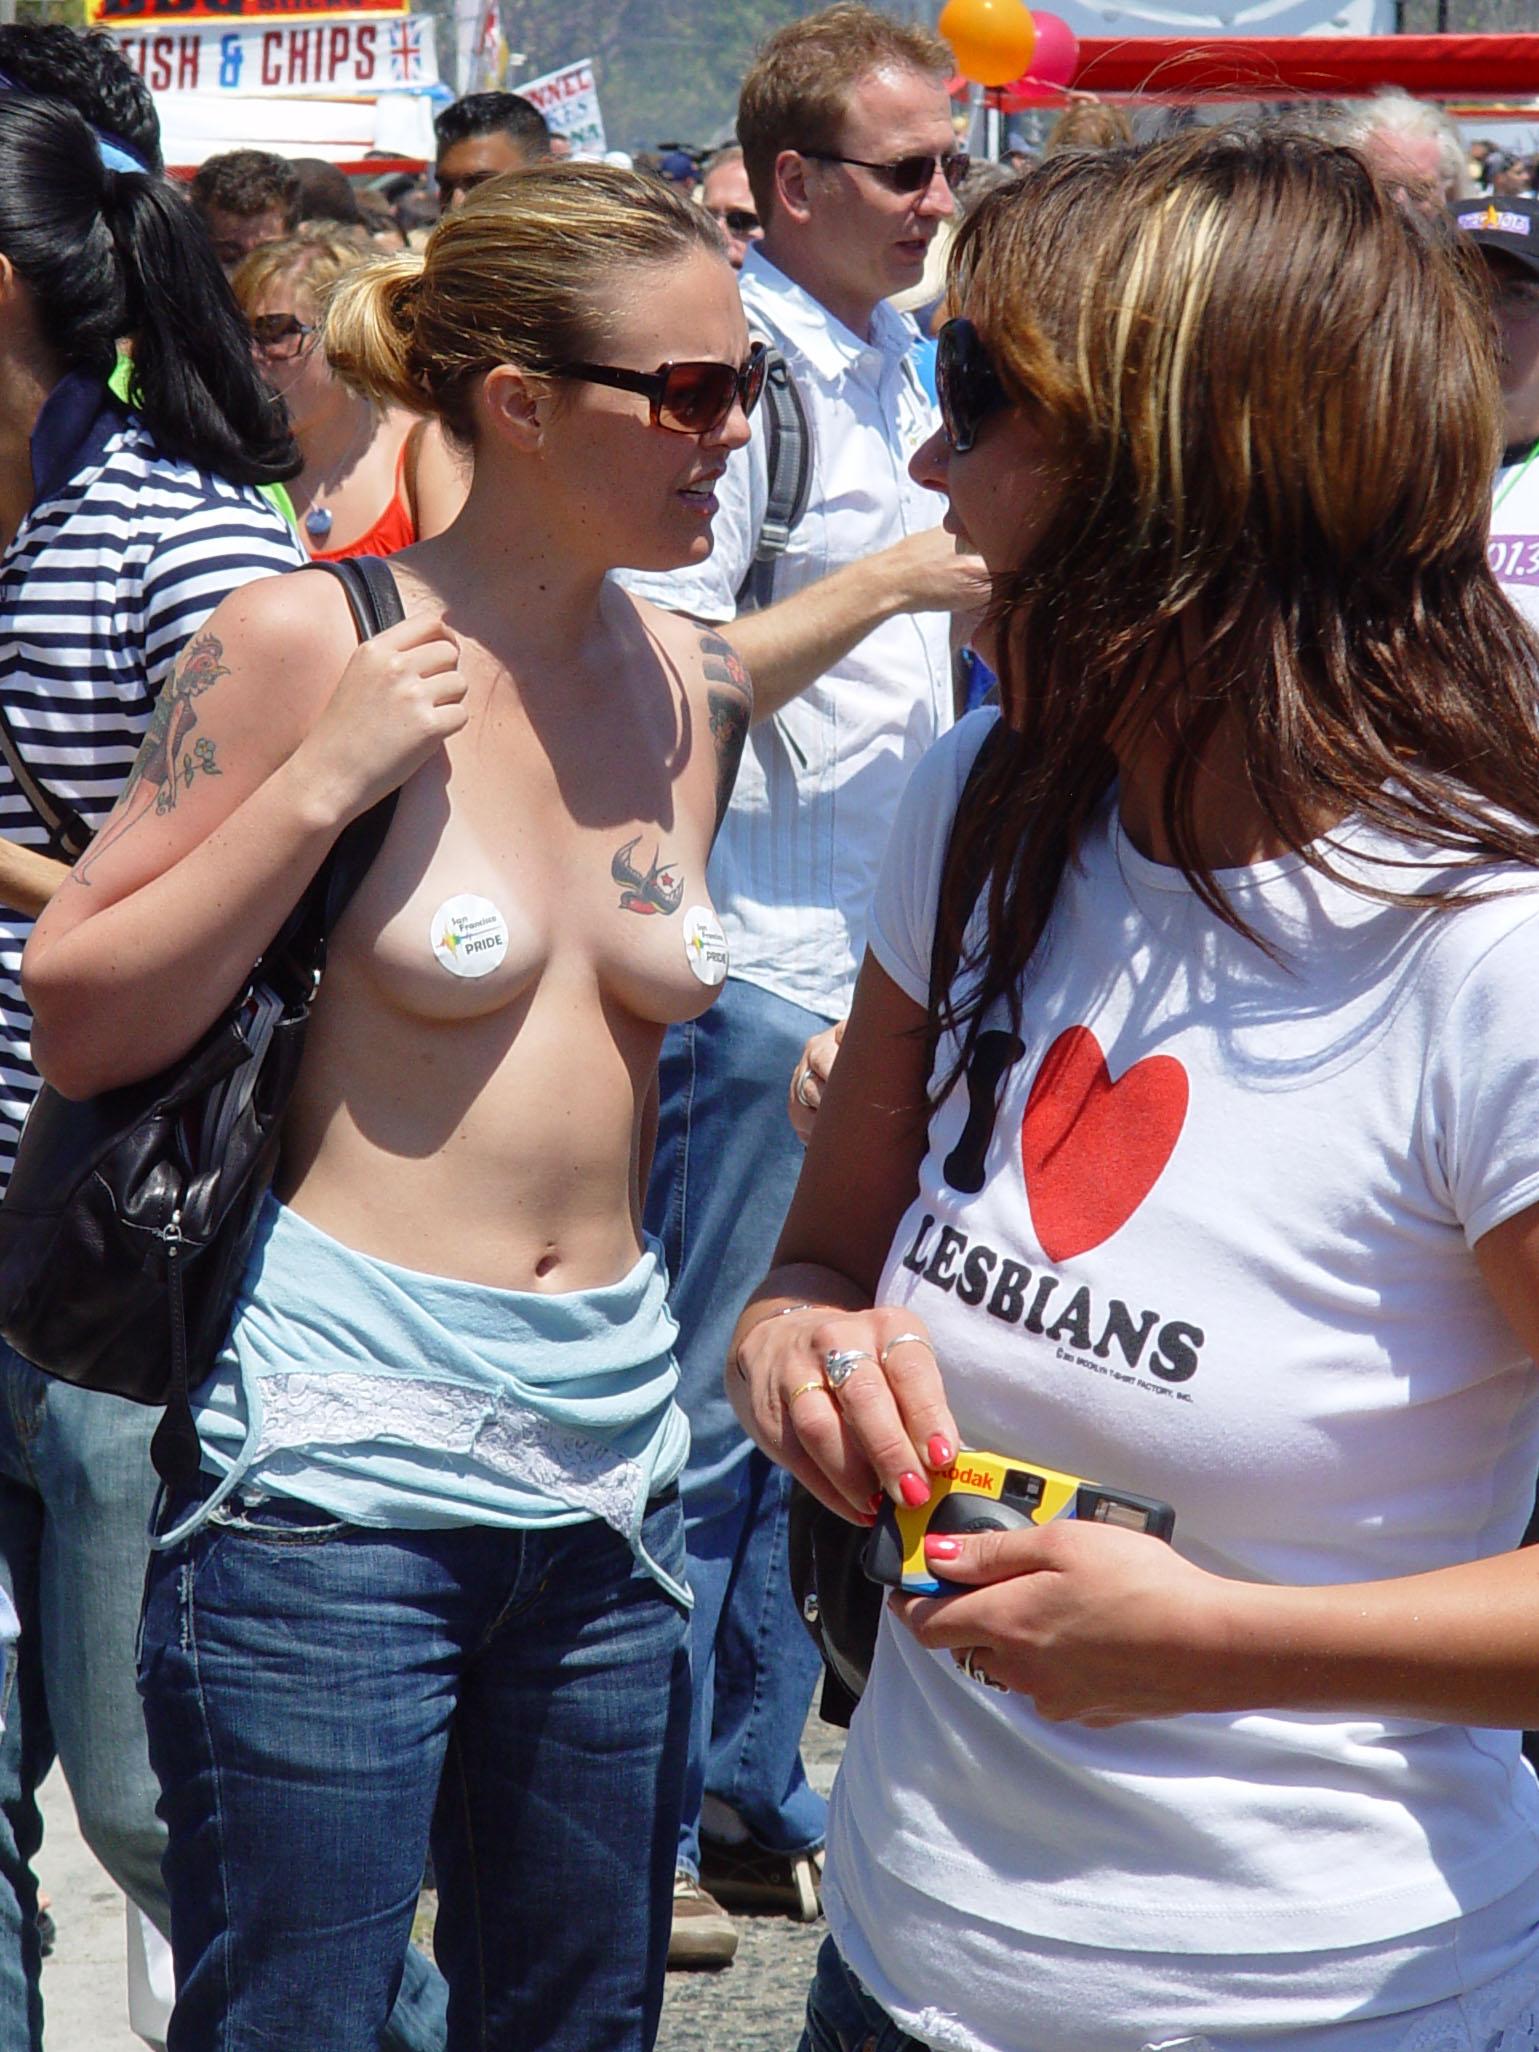 society pflag Bisexual lesbian organization gay